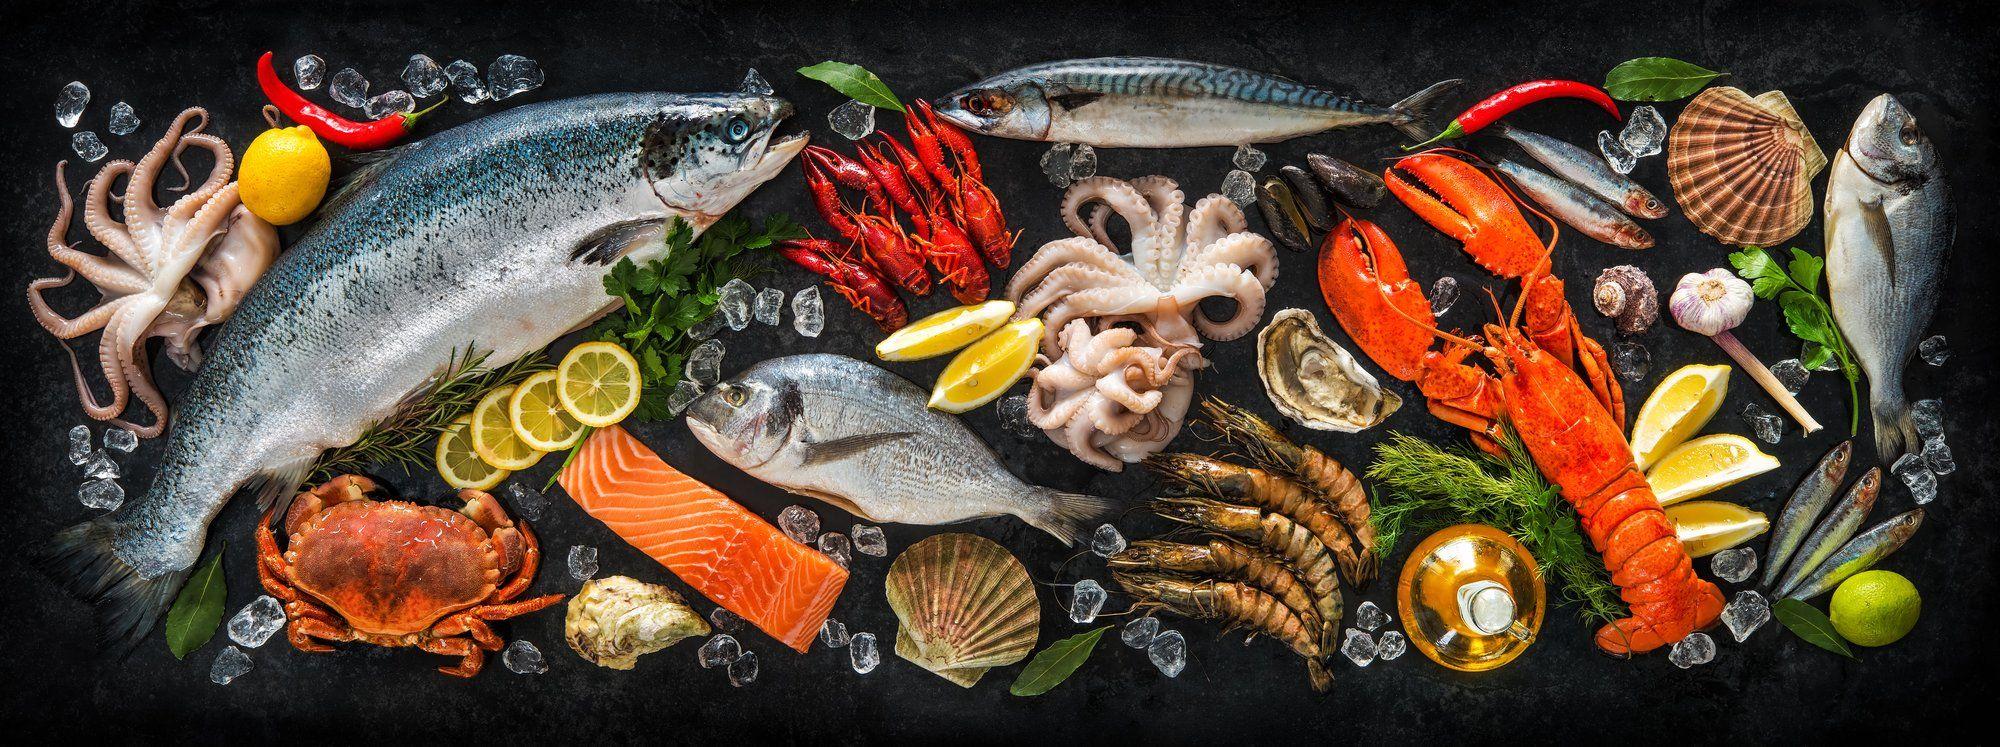 Qatar's Fish.qa closes its Seed round